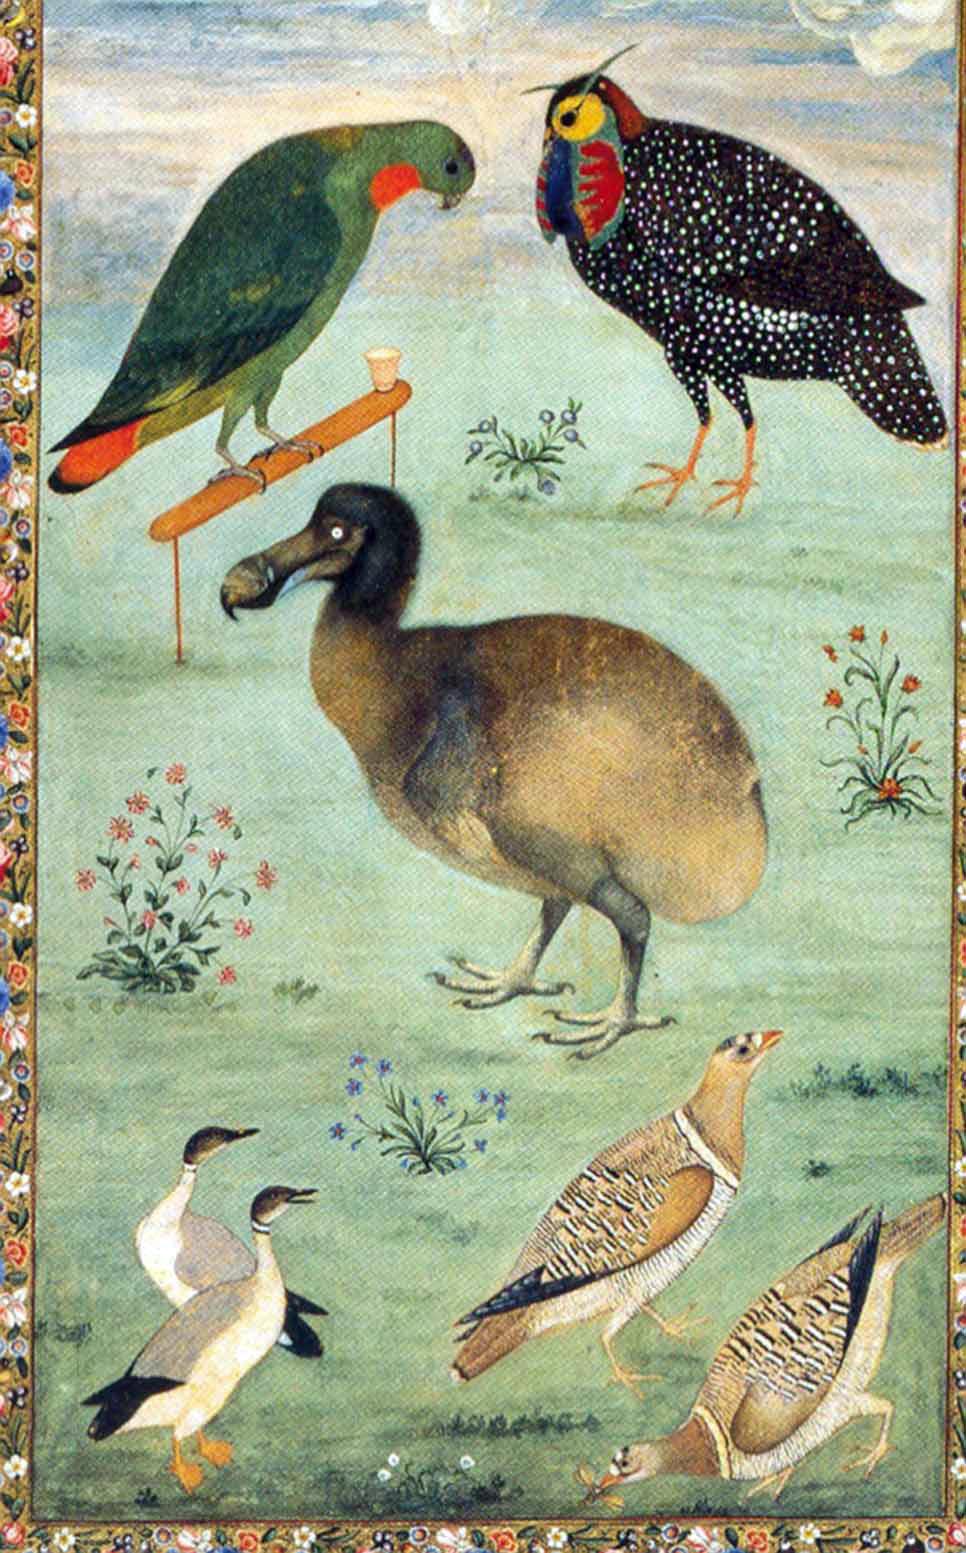 Mughlai maalaus 1600-luvulta